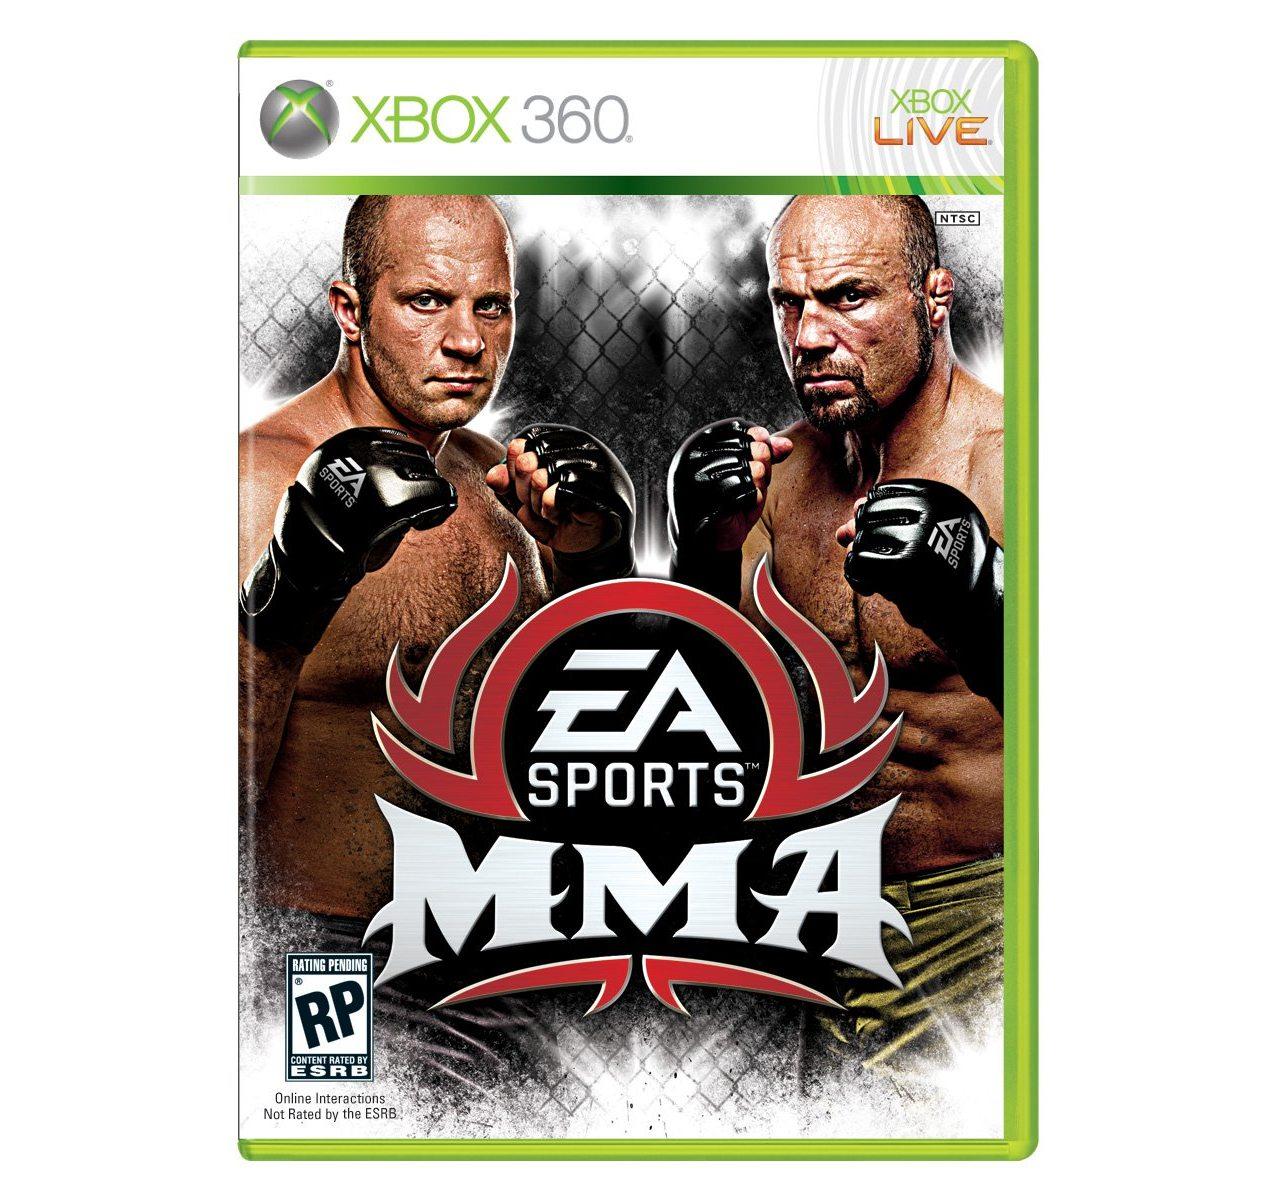 Xbox 360 EA Sports MMA Xbox 360